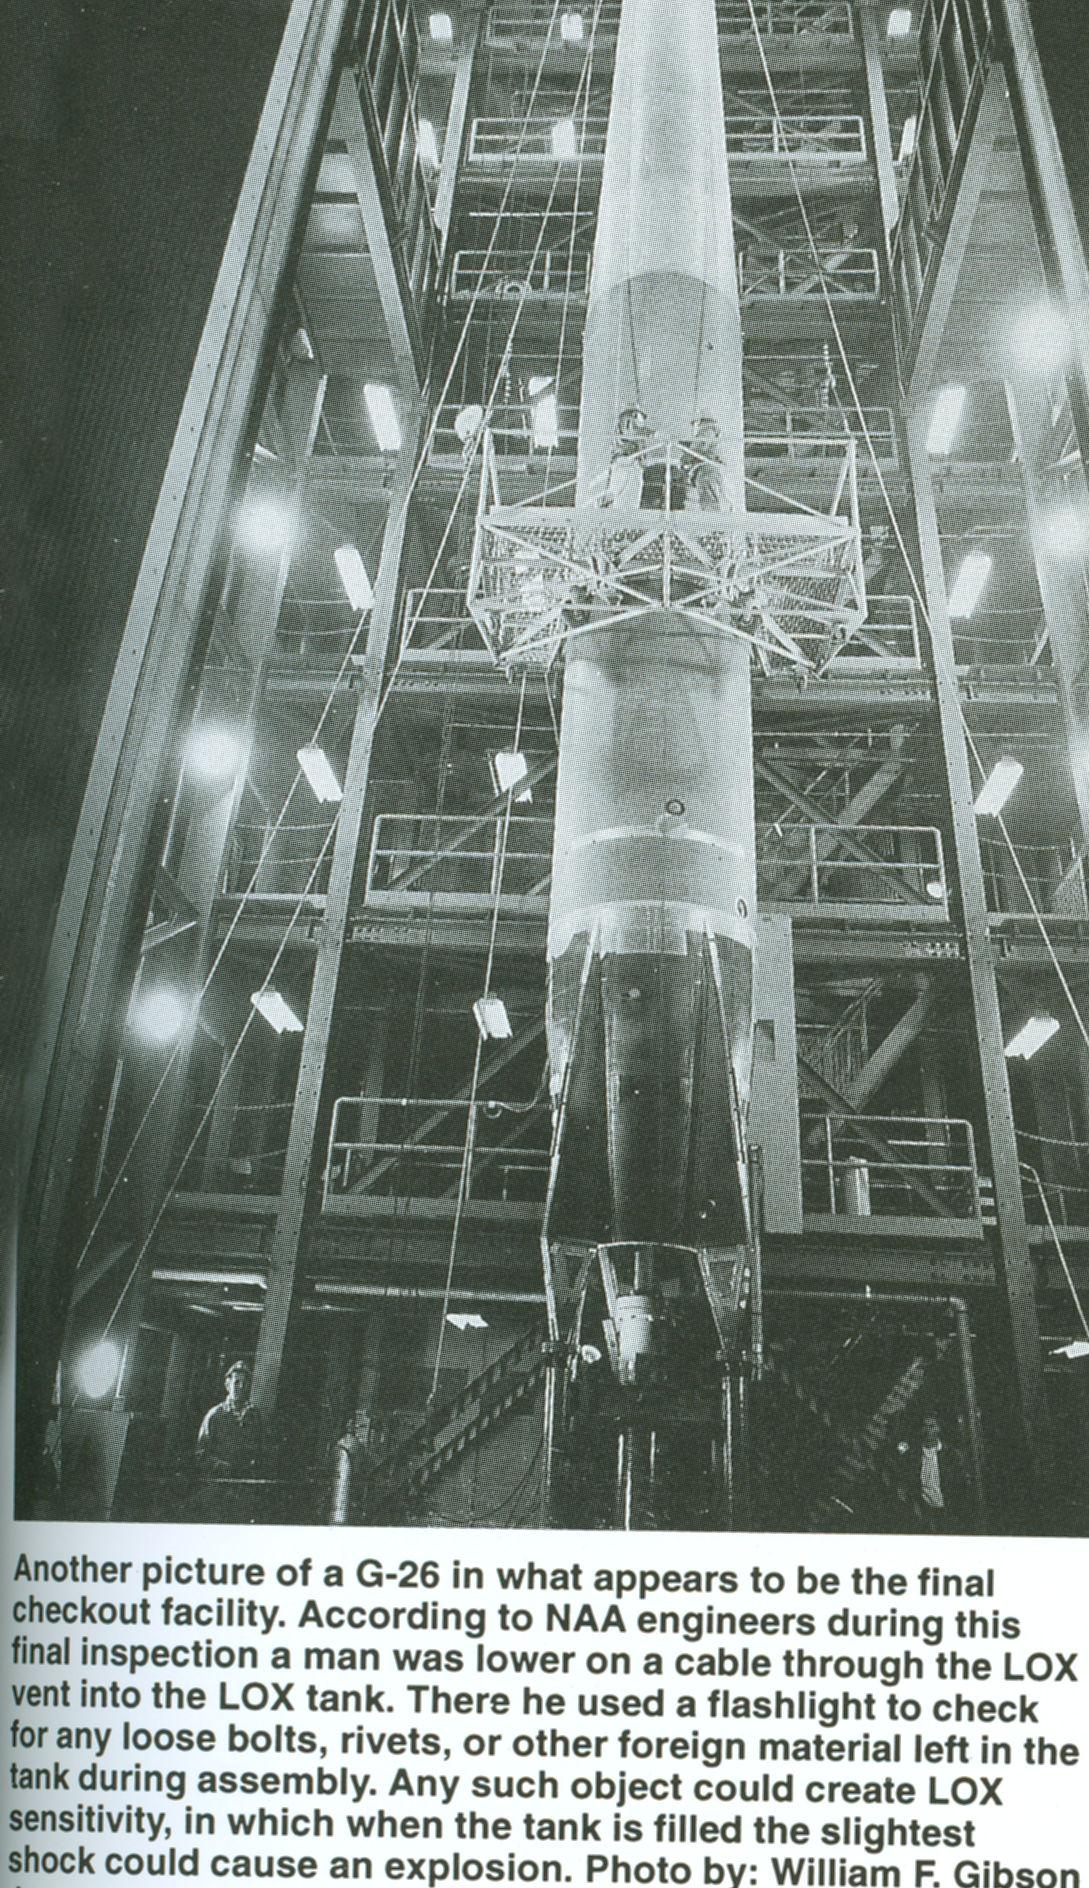 13 each X-10 vehicles were built in the original NASA test program.